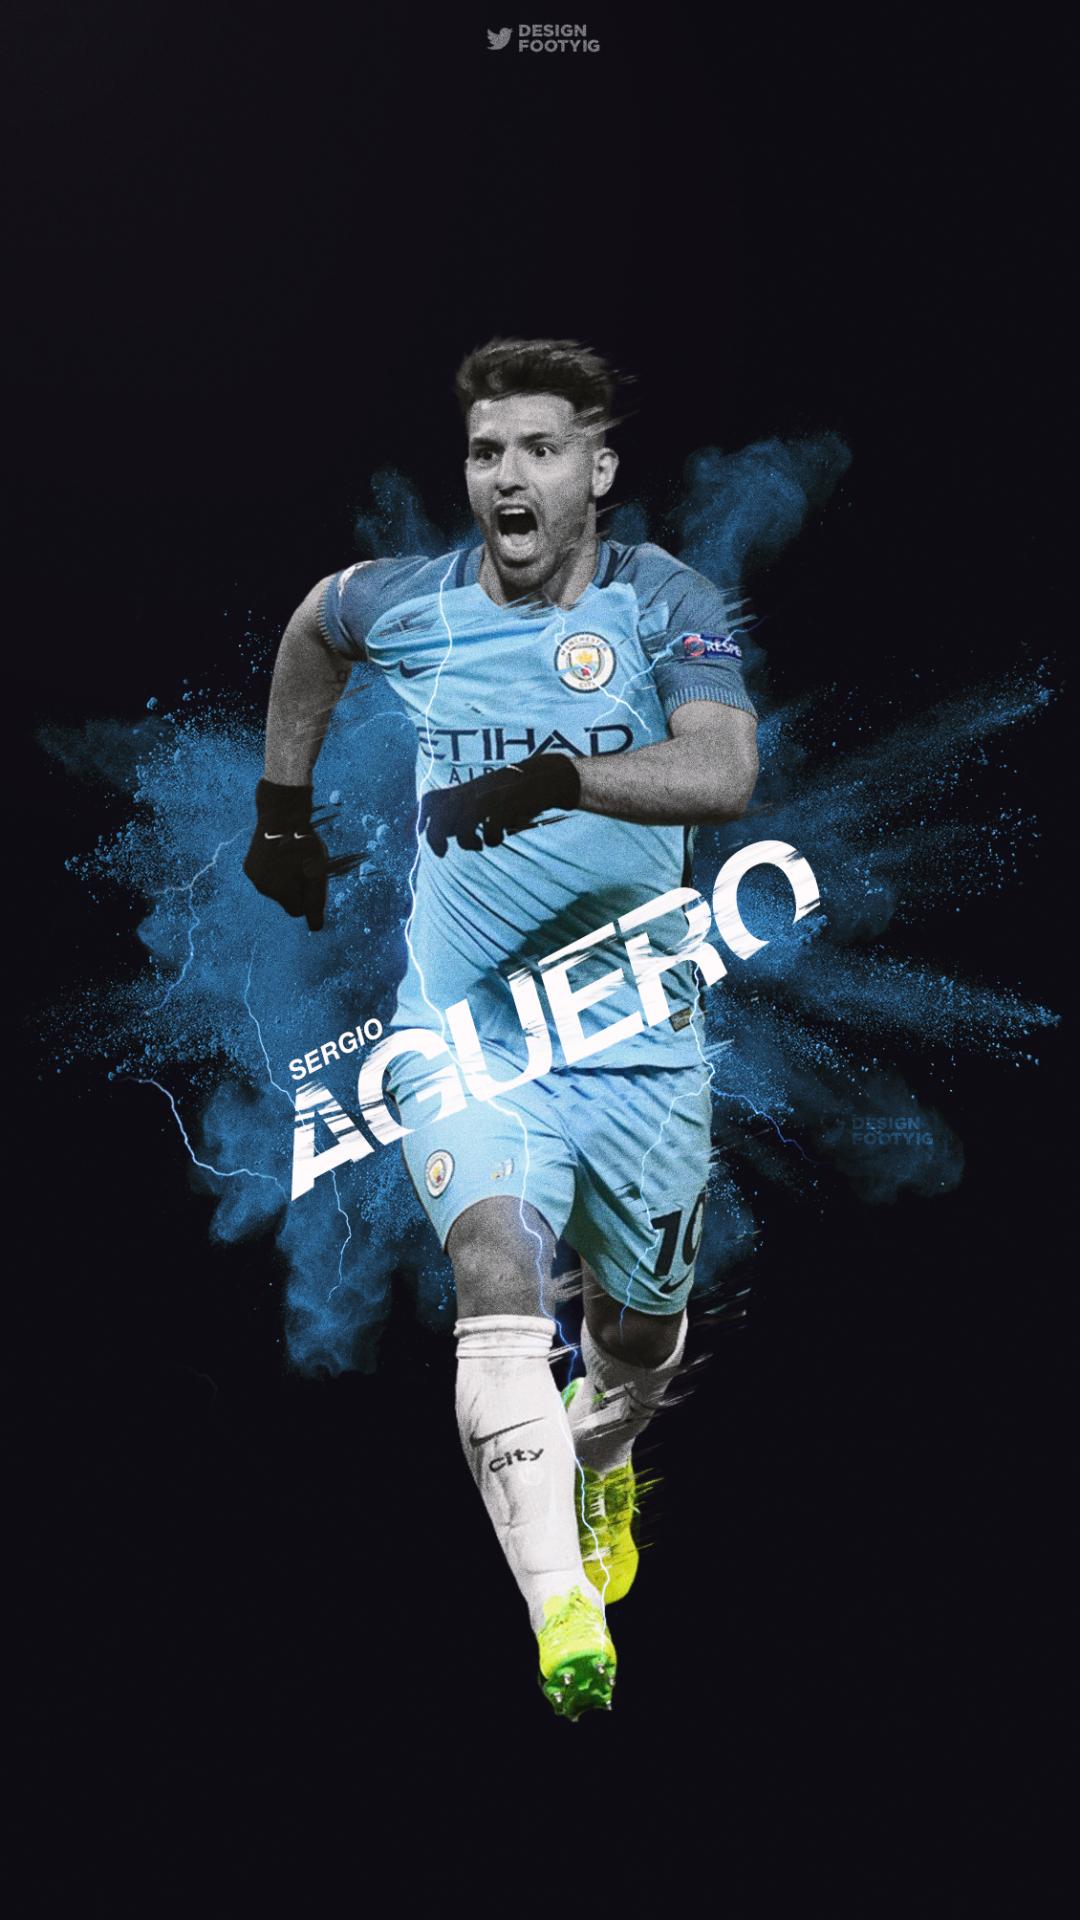 DESIGNDANIEL Sergio Kun Aguero Edit Phone Wallpaper By Design Daniel On Tumblr Football